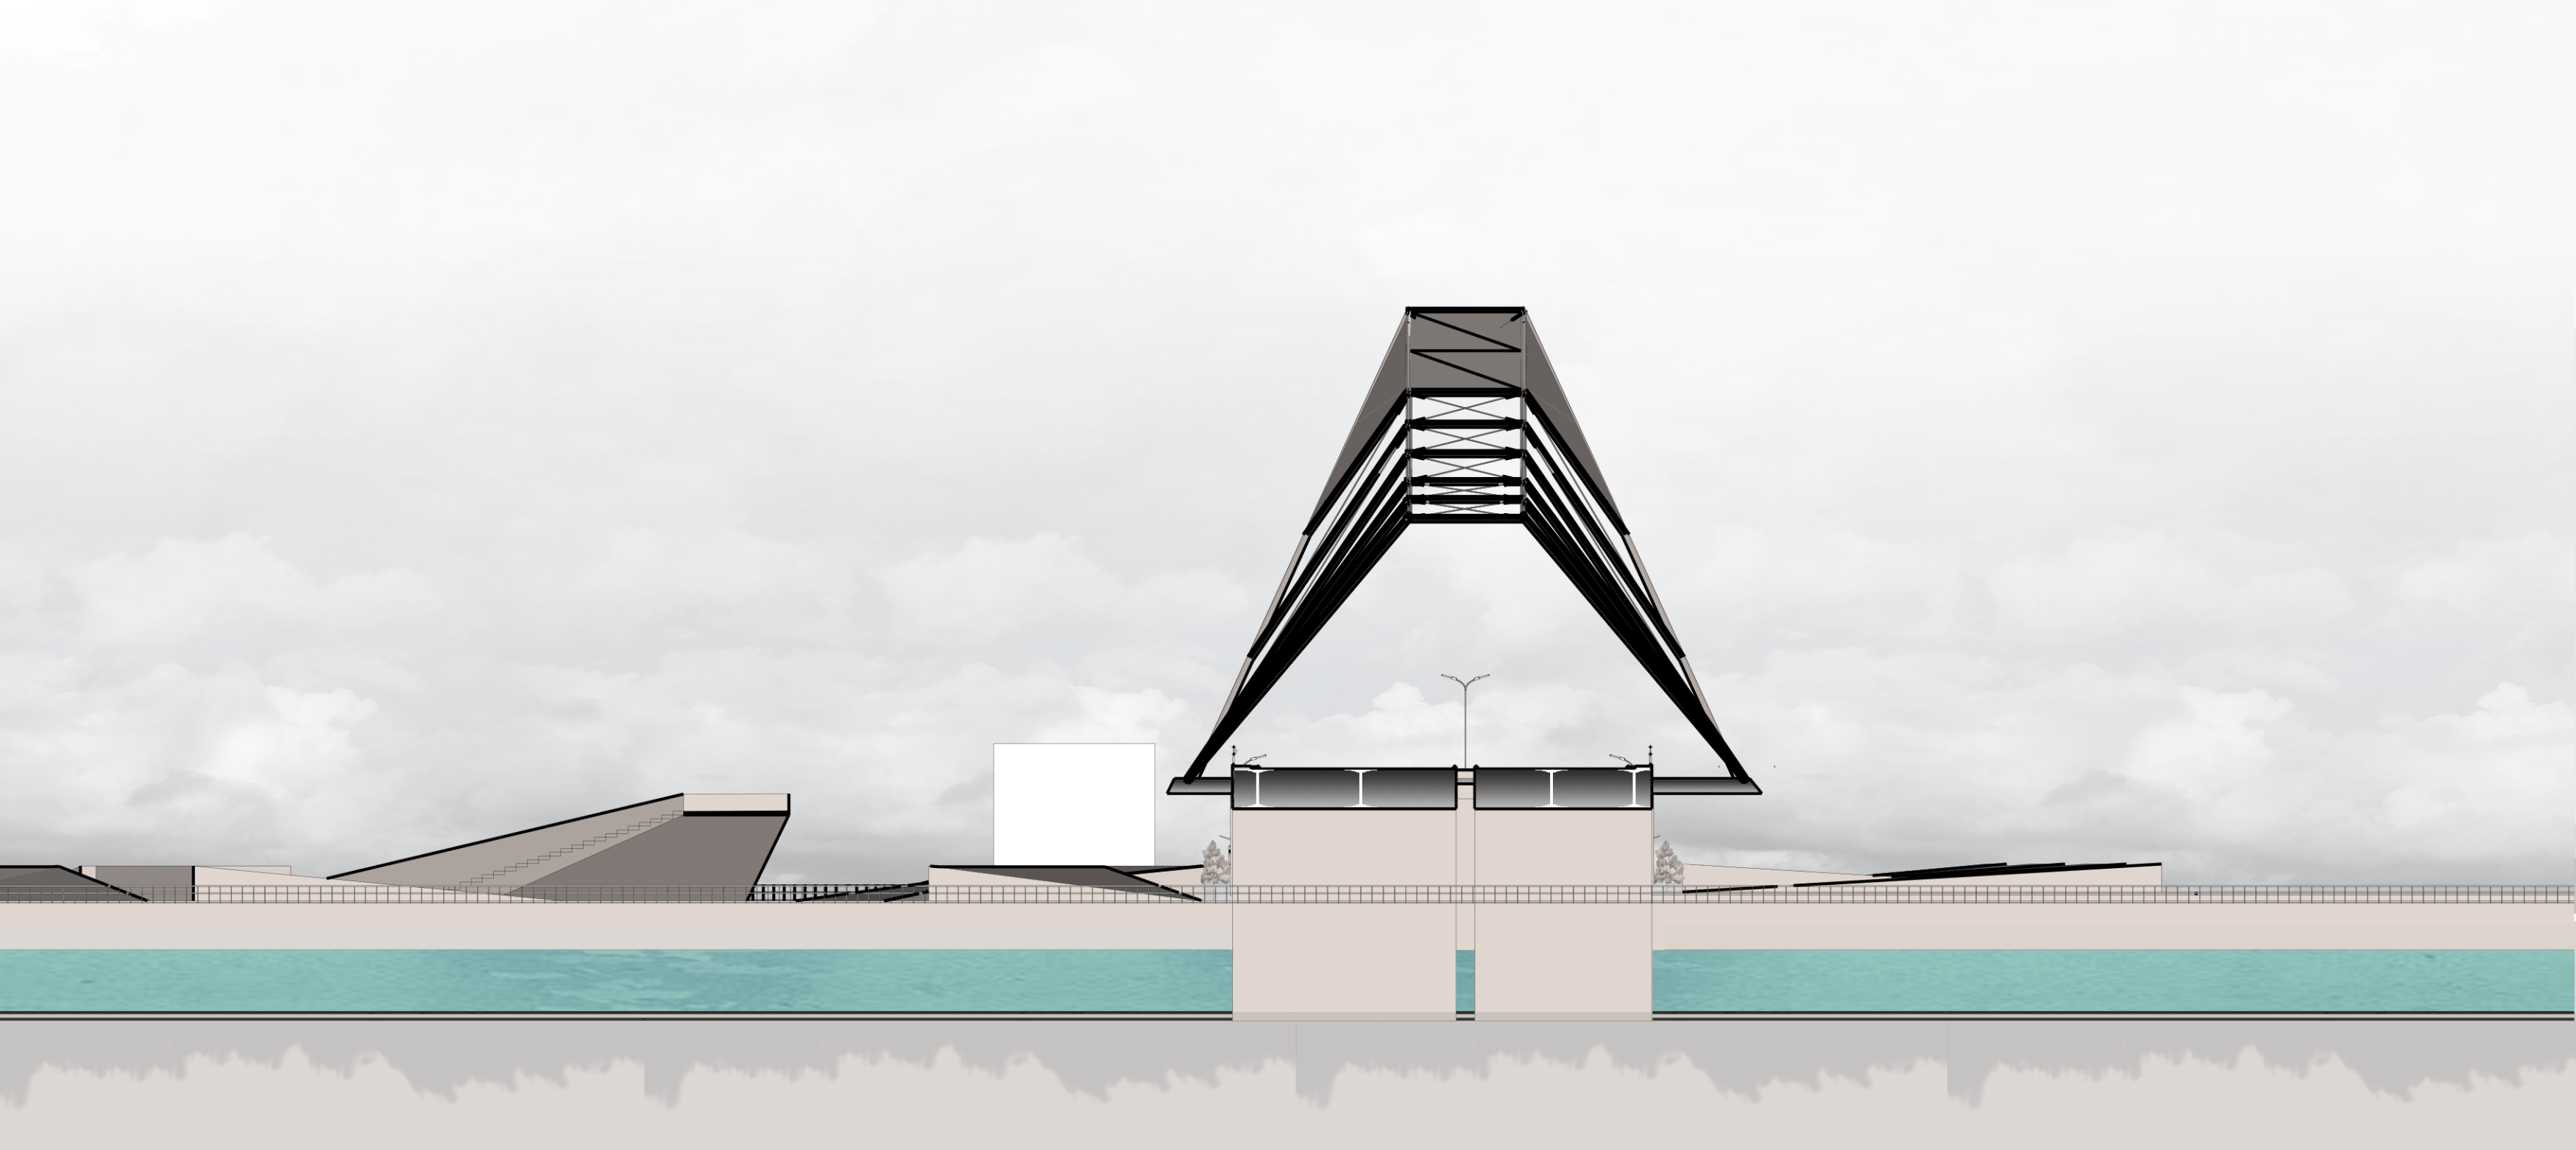 Atelier Baou Purus Bridge  Padang, Kota Padang, Sumatera Barat, Indonesia Padang, Kota Padang, Sumatera Barat, Indonesia Potongan Modern  52480